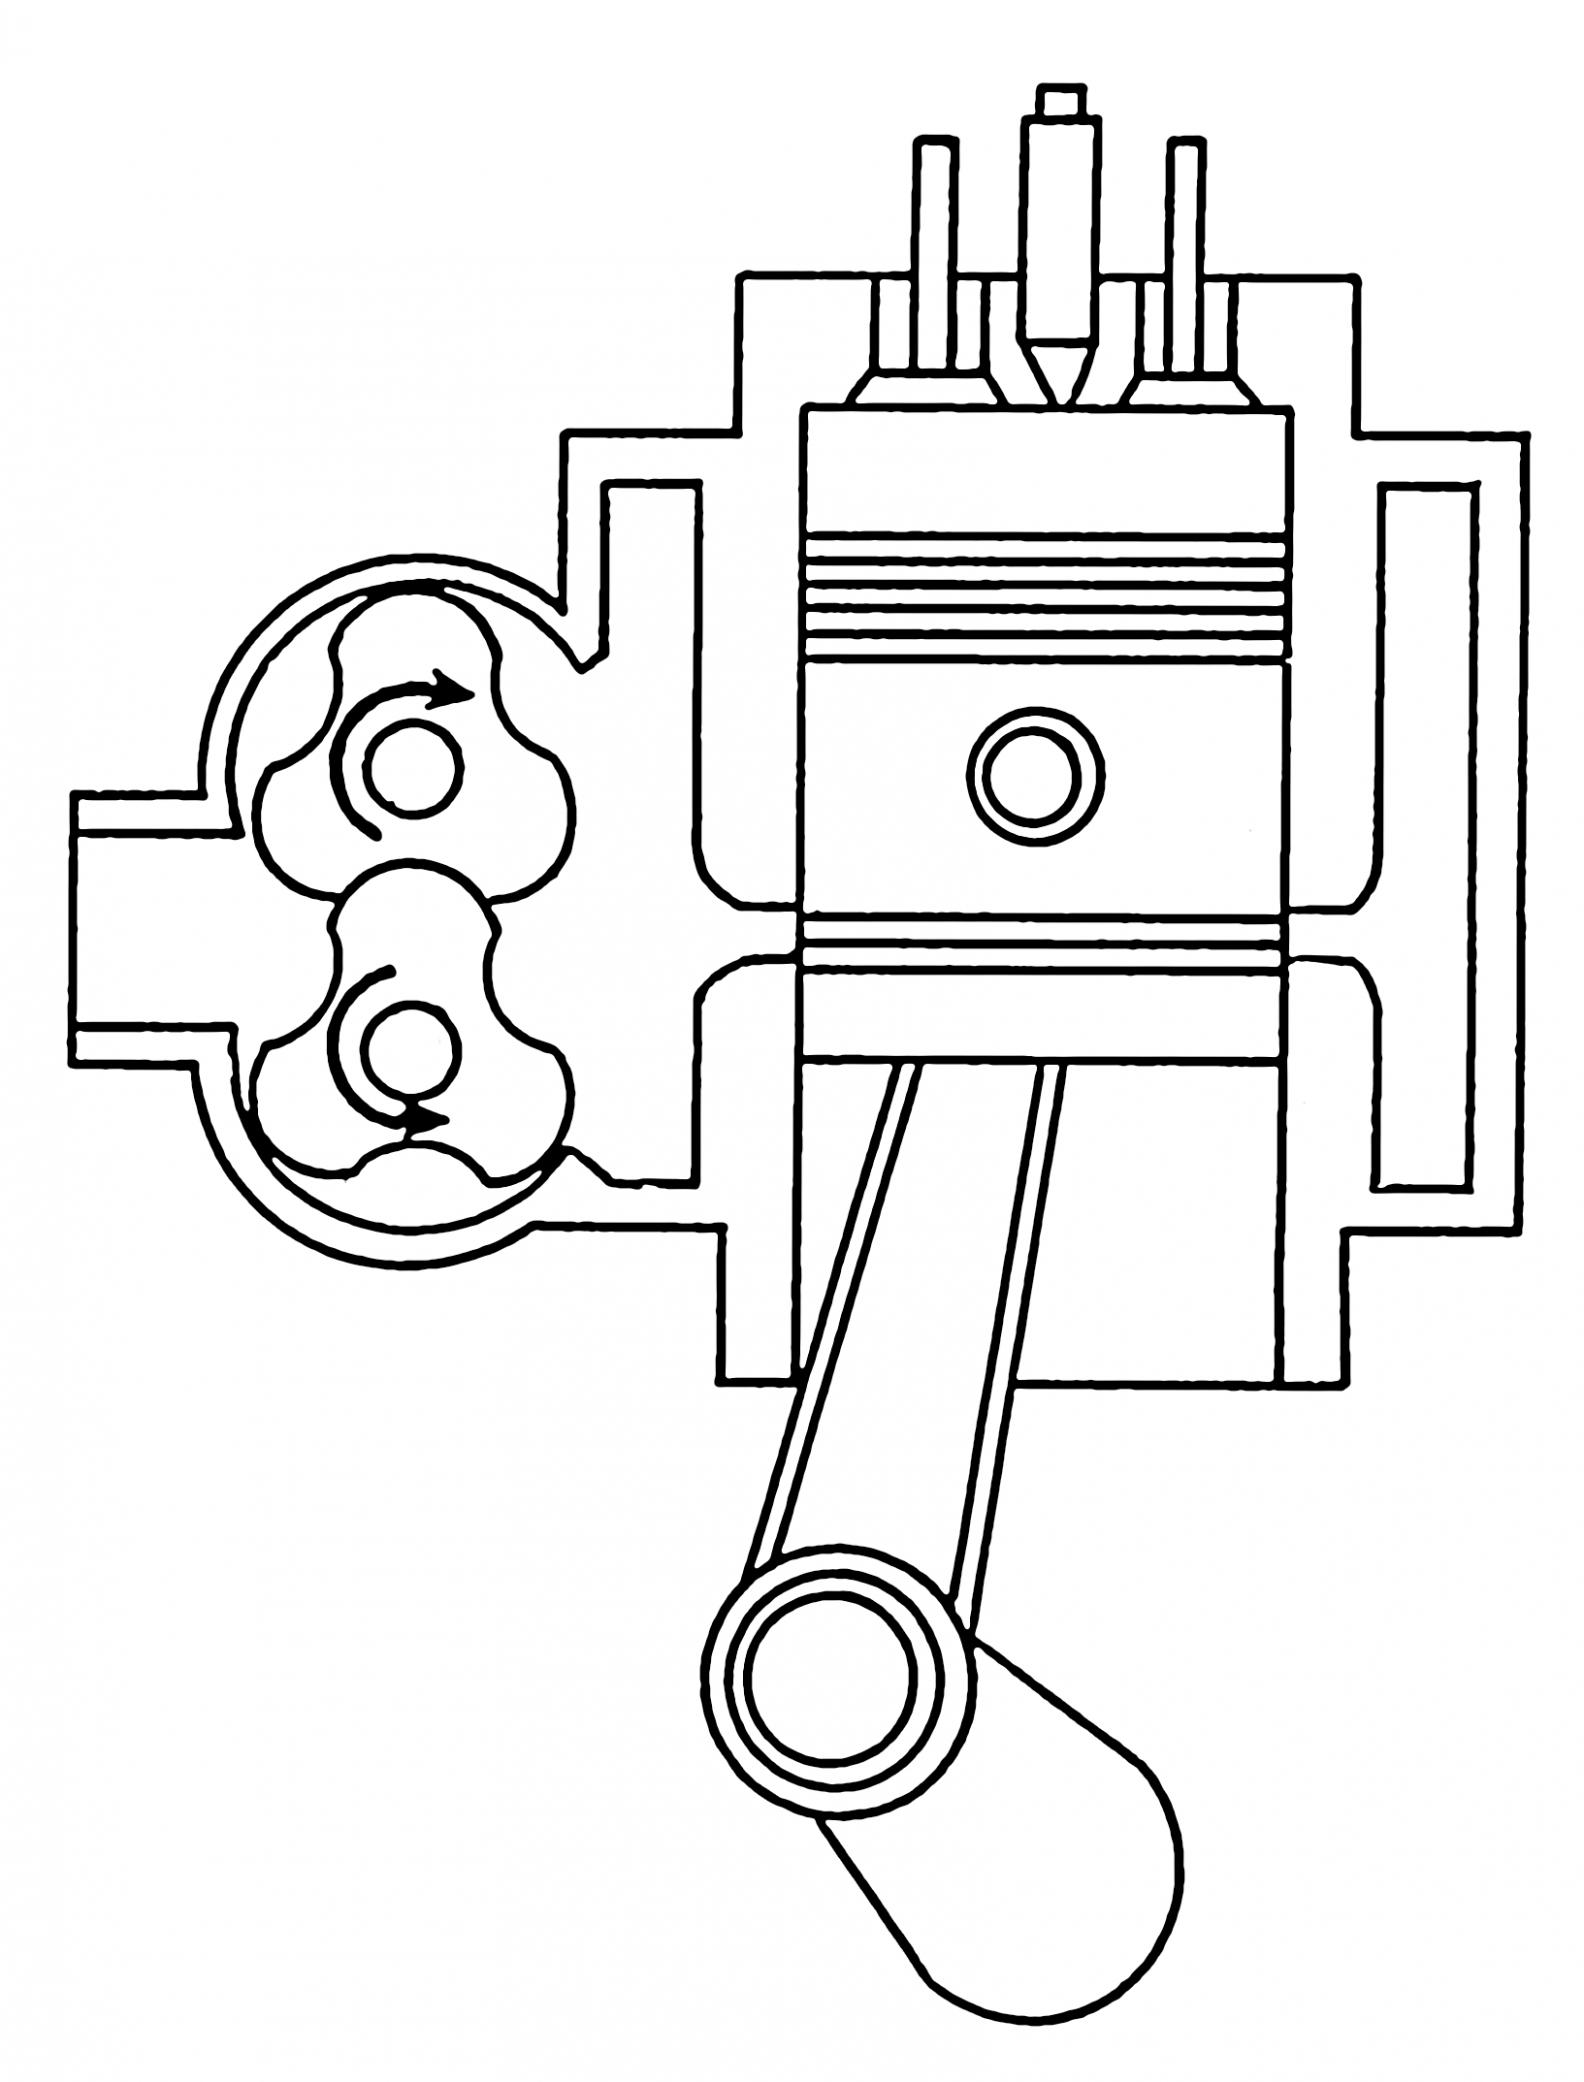 Two Stroke Diesel Engine Line Diagram di 2020